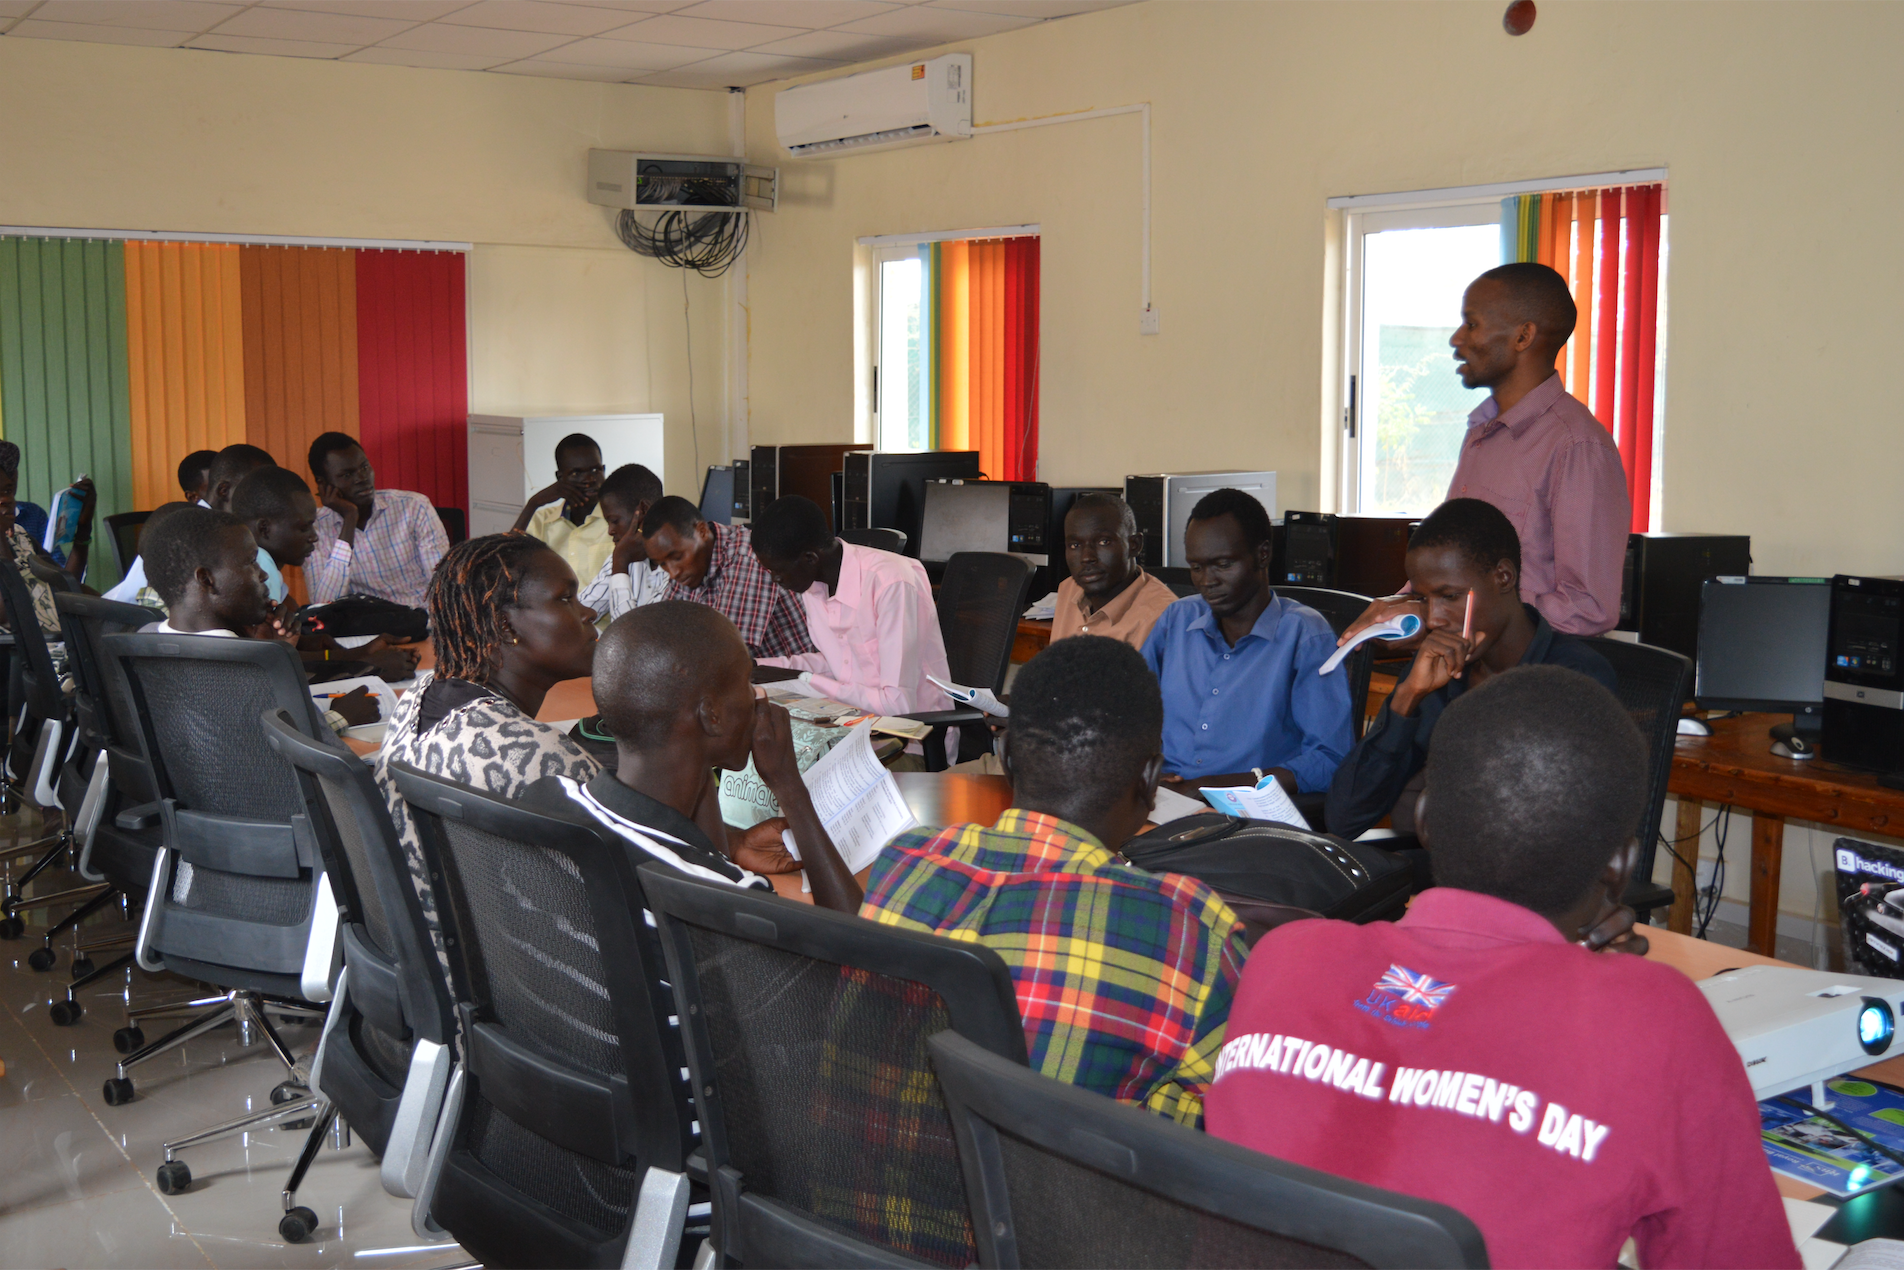 Students at kakuma refugee camp